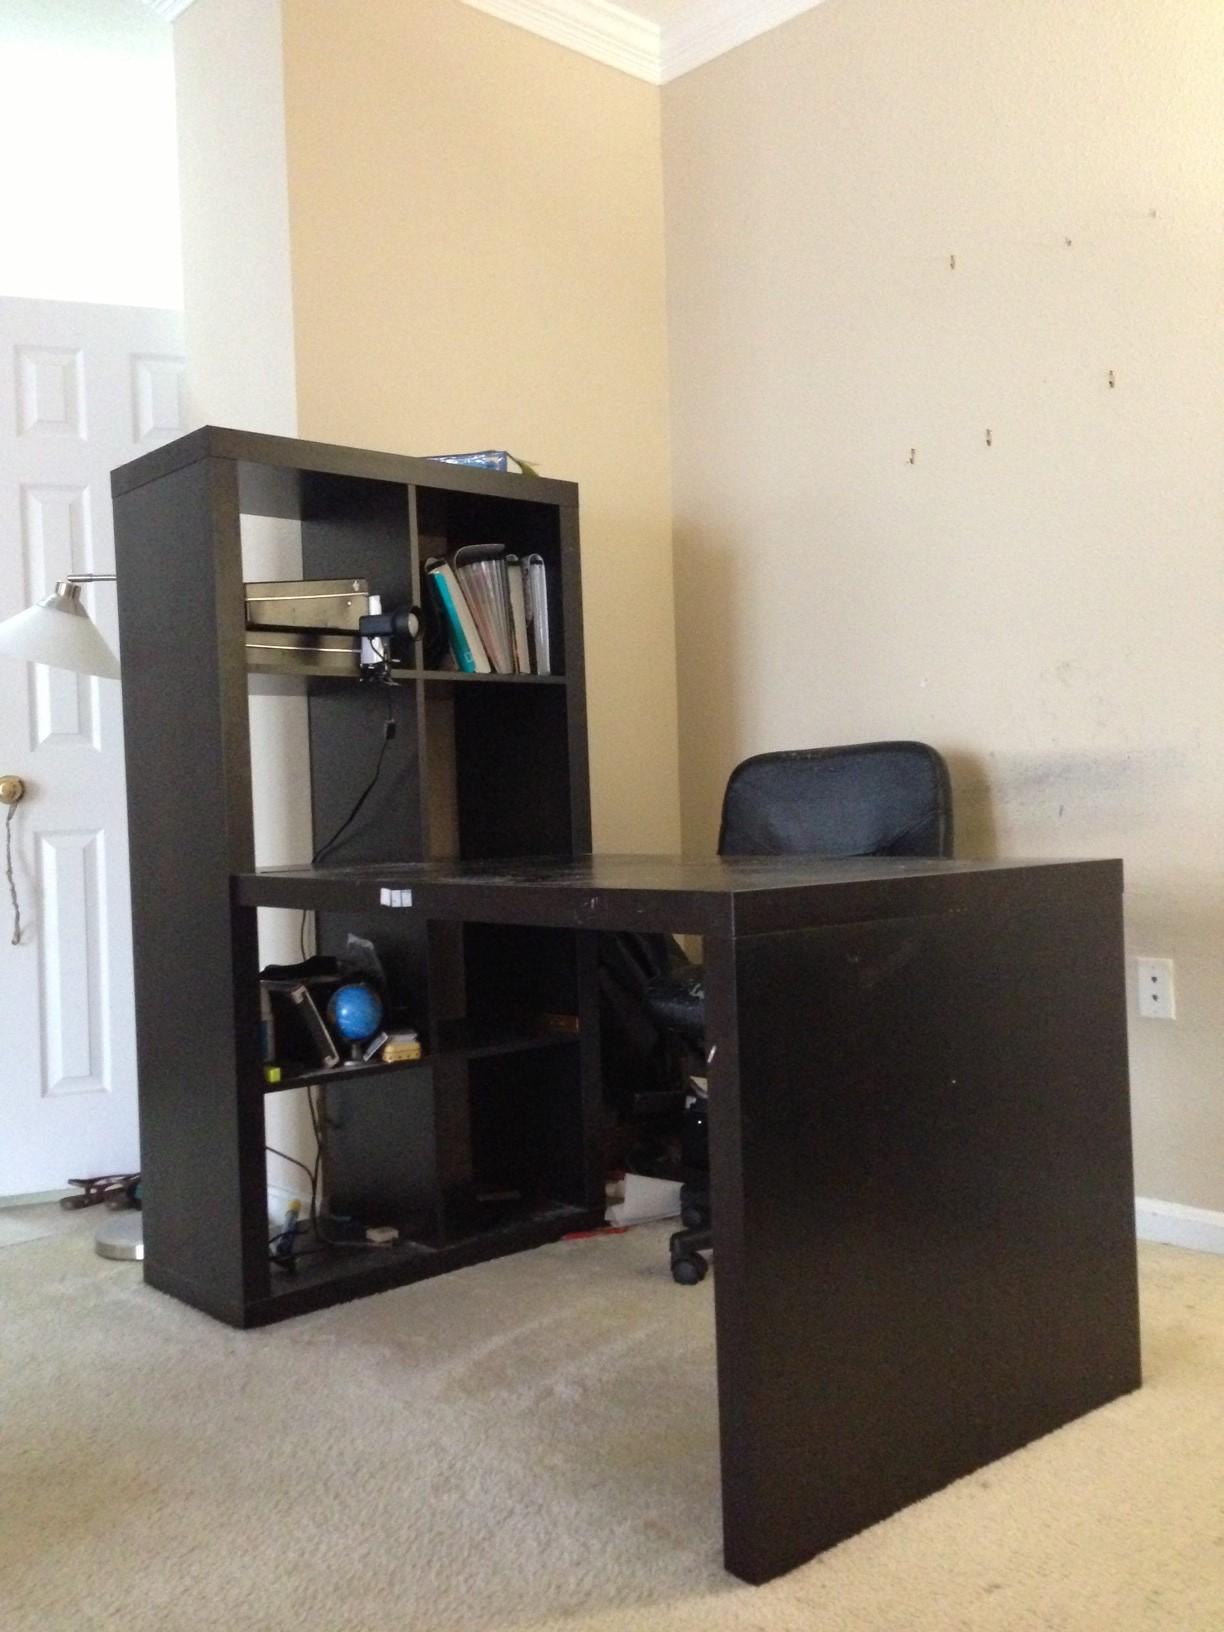 Ikea Expedit Bookshelf 4 X 2 40 50 With Desk E